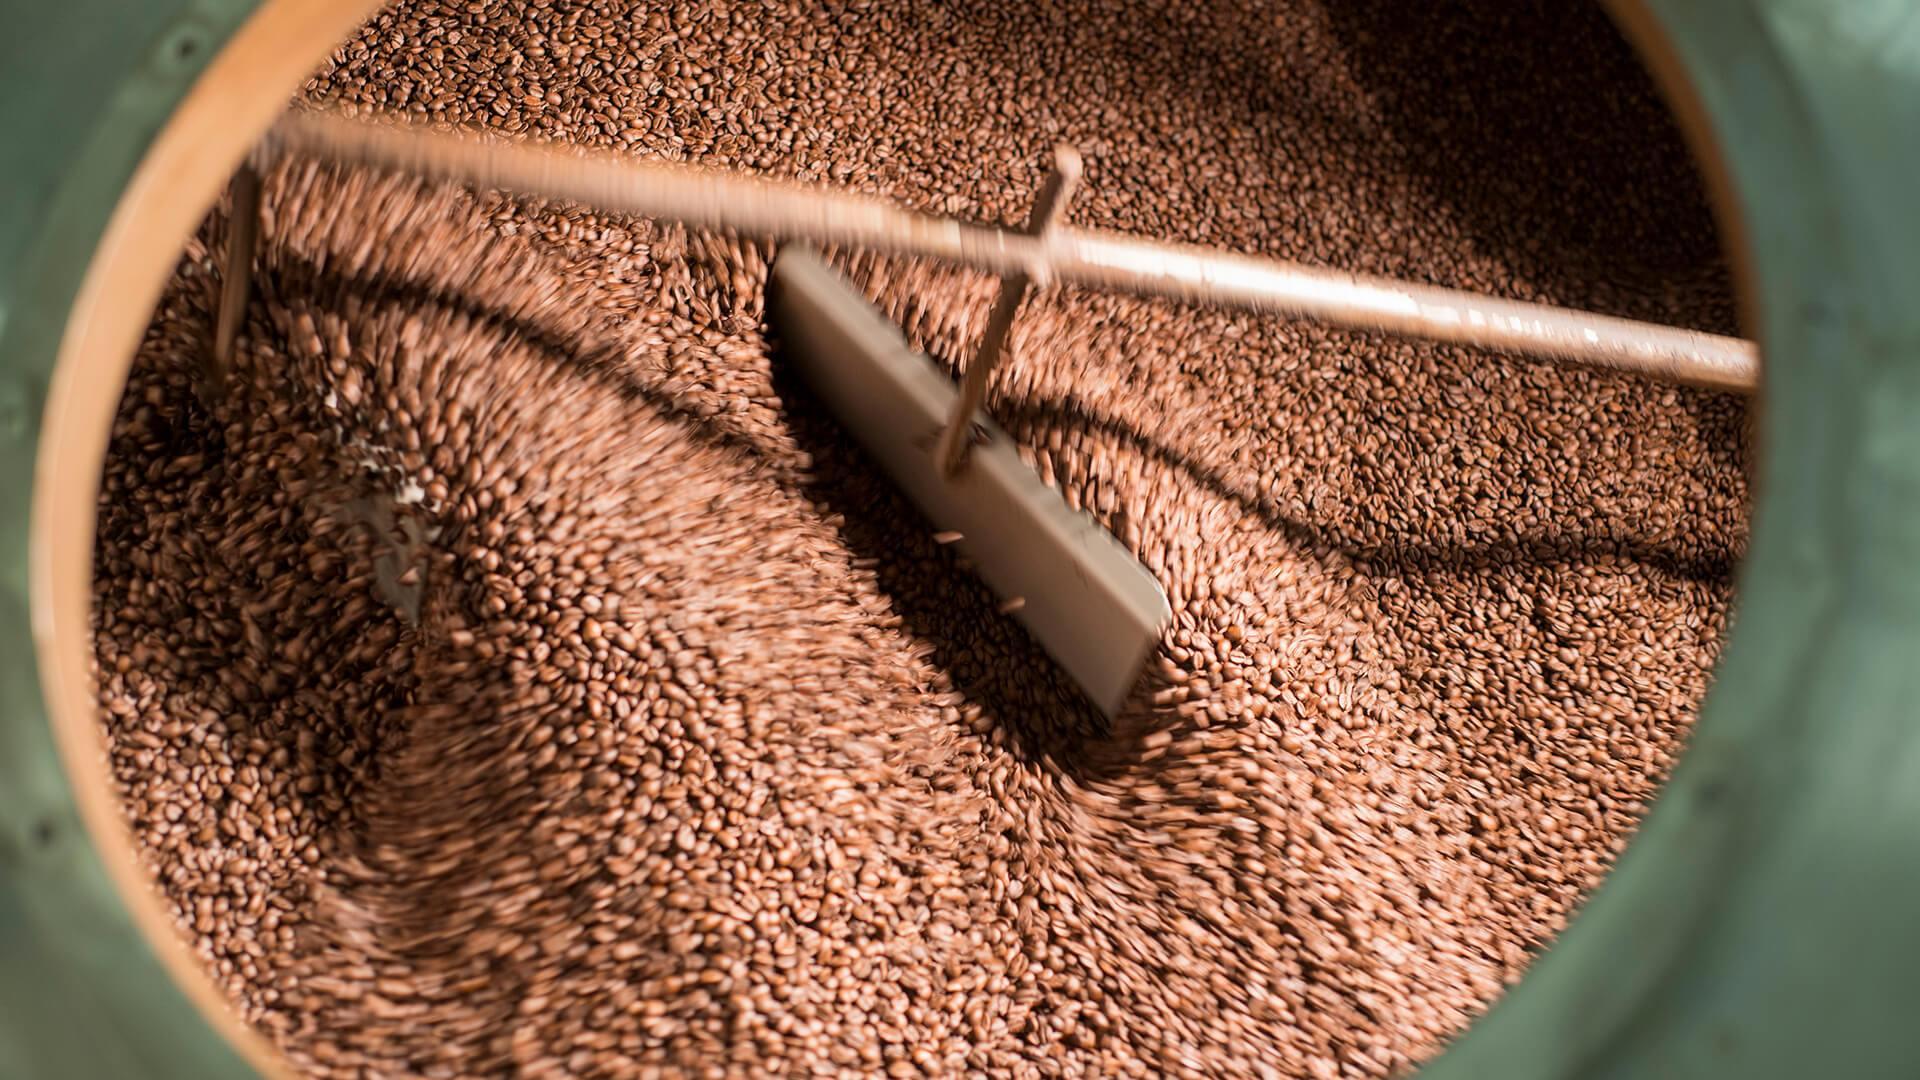 miscele caffè rossini alba, caffè ad alba, bar alba, caffetterie alba, miscele per bar alba, rossini torrefazione, torrefazione caffè alba